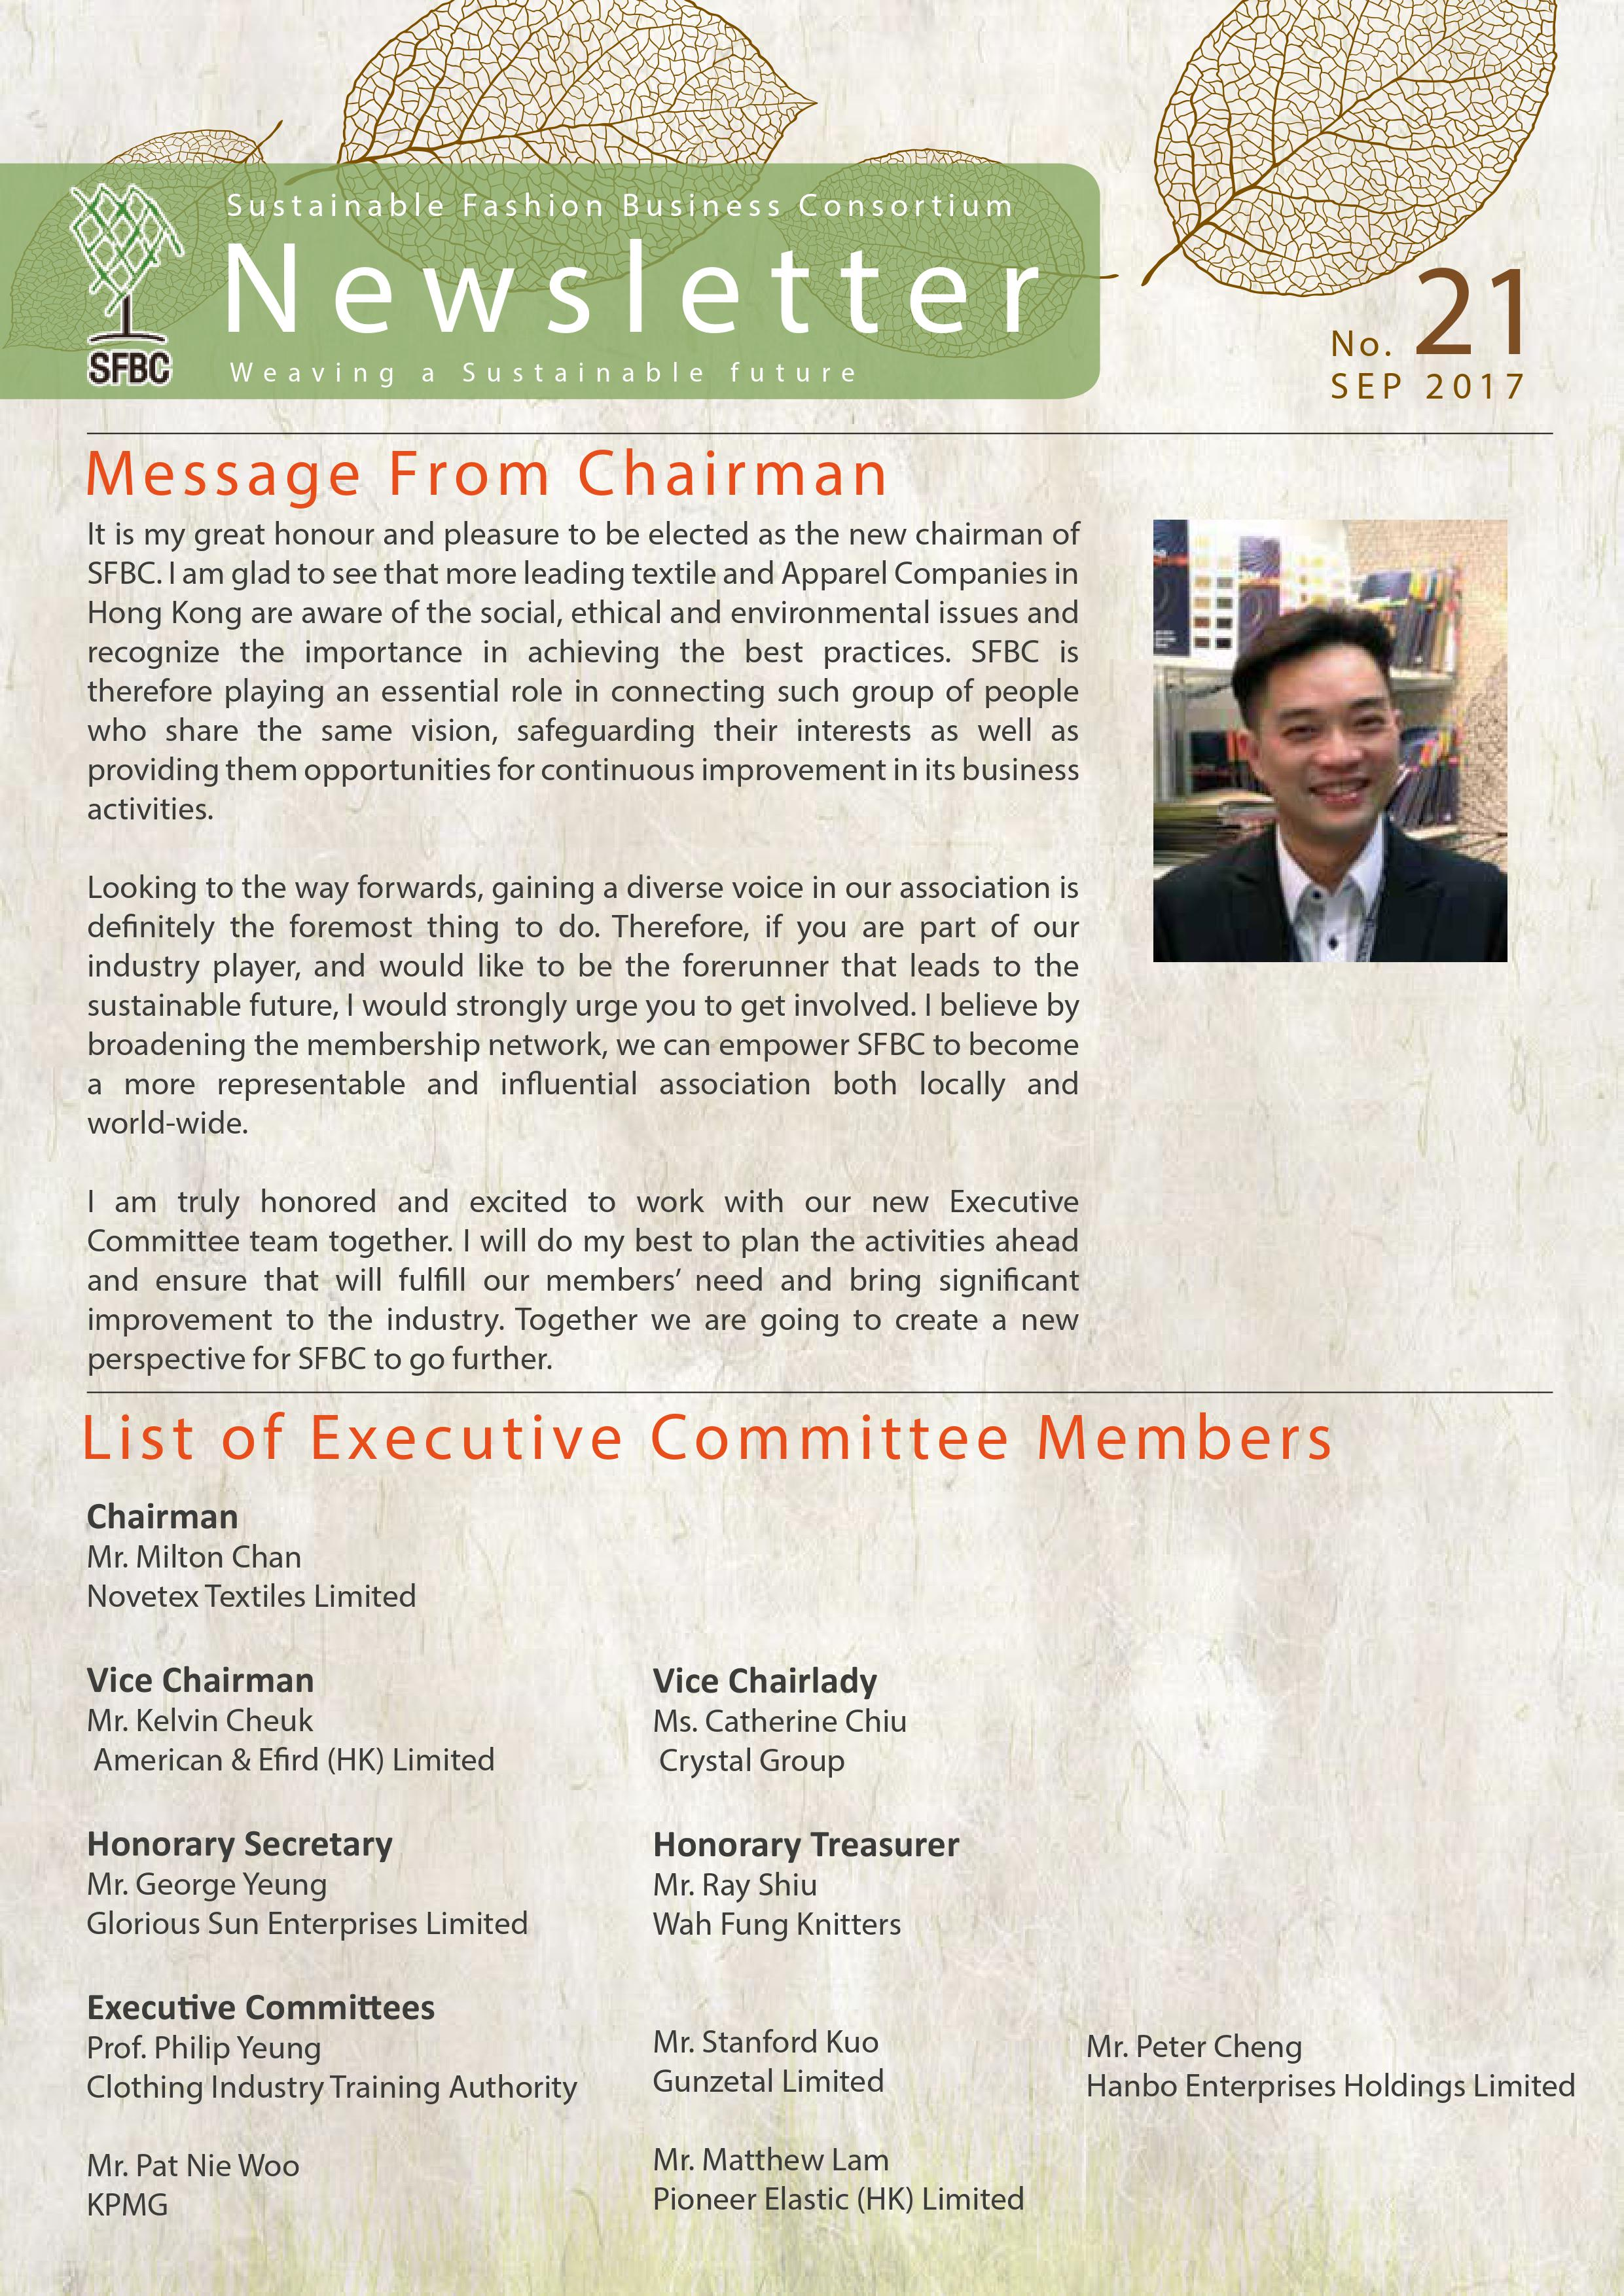 SFBC 21st Newsletter